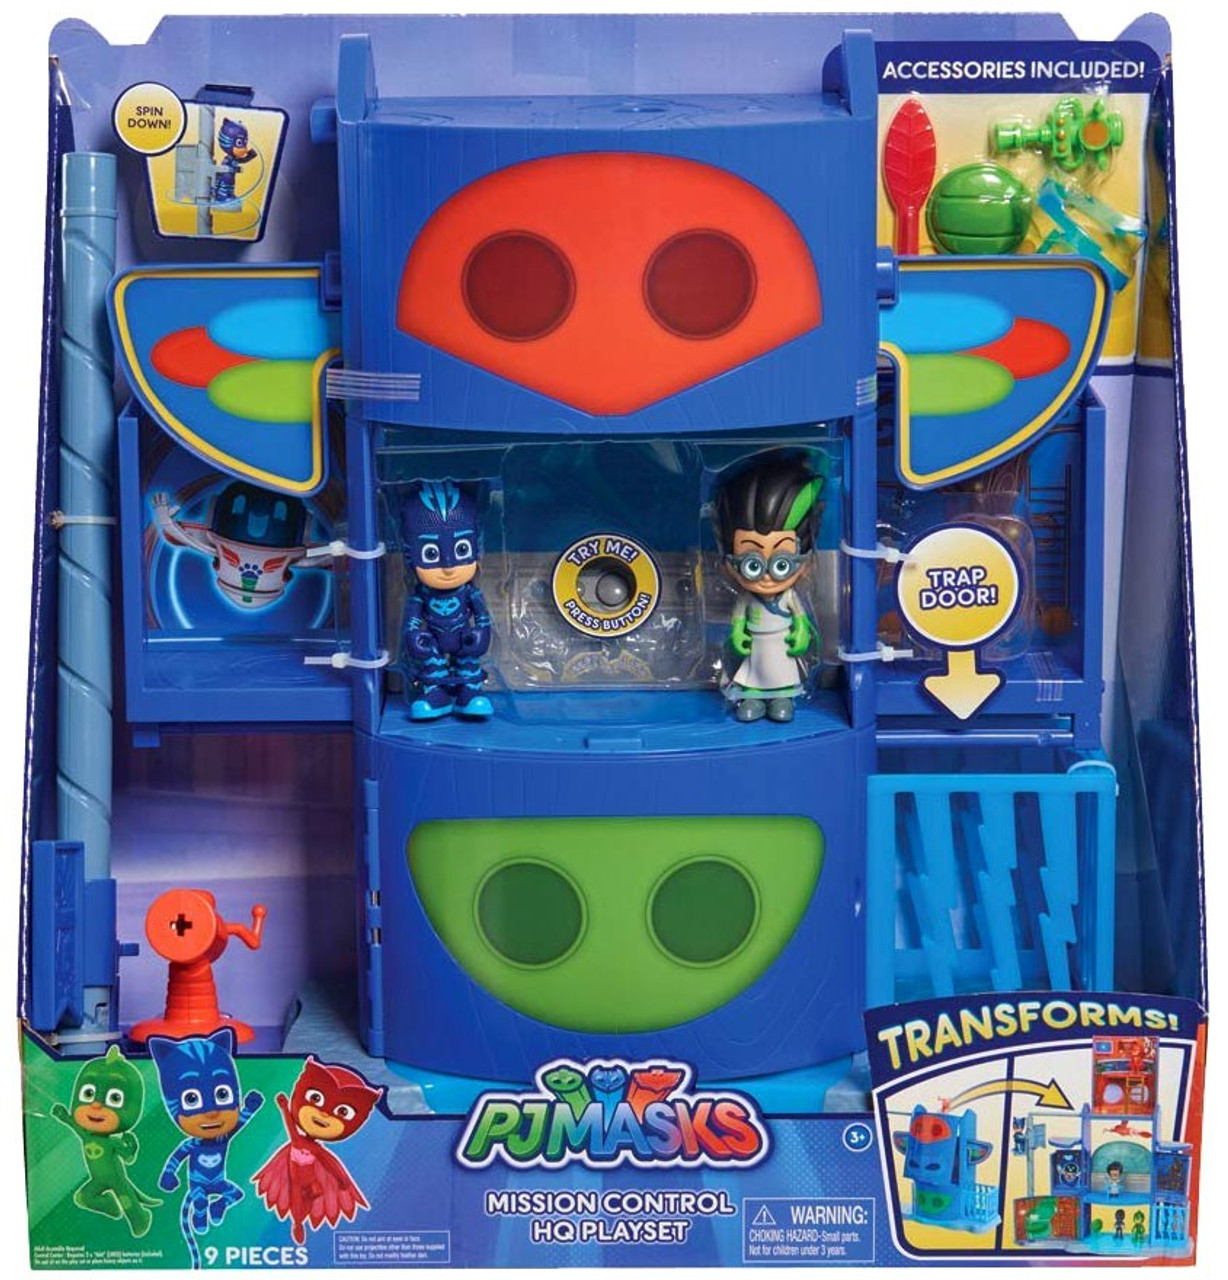 Disney Junior PJ Masks Headquarters Playset by Just Play